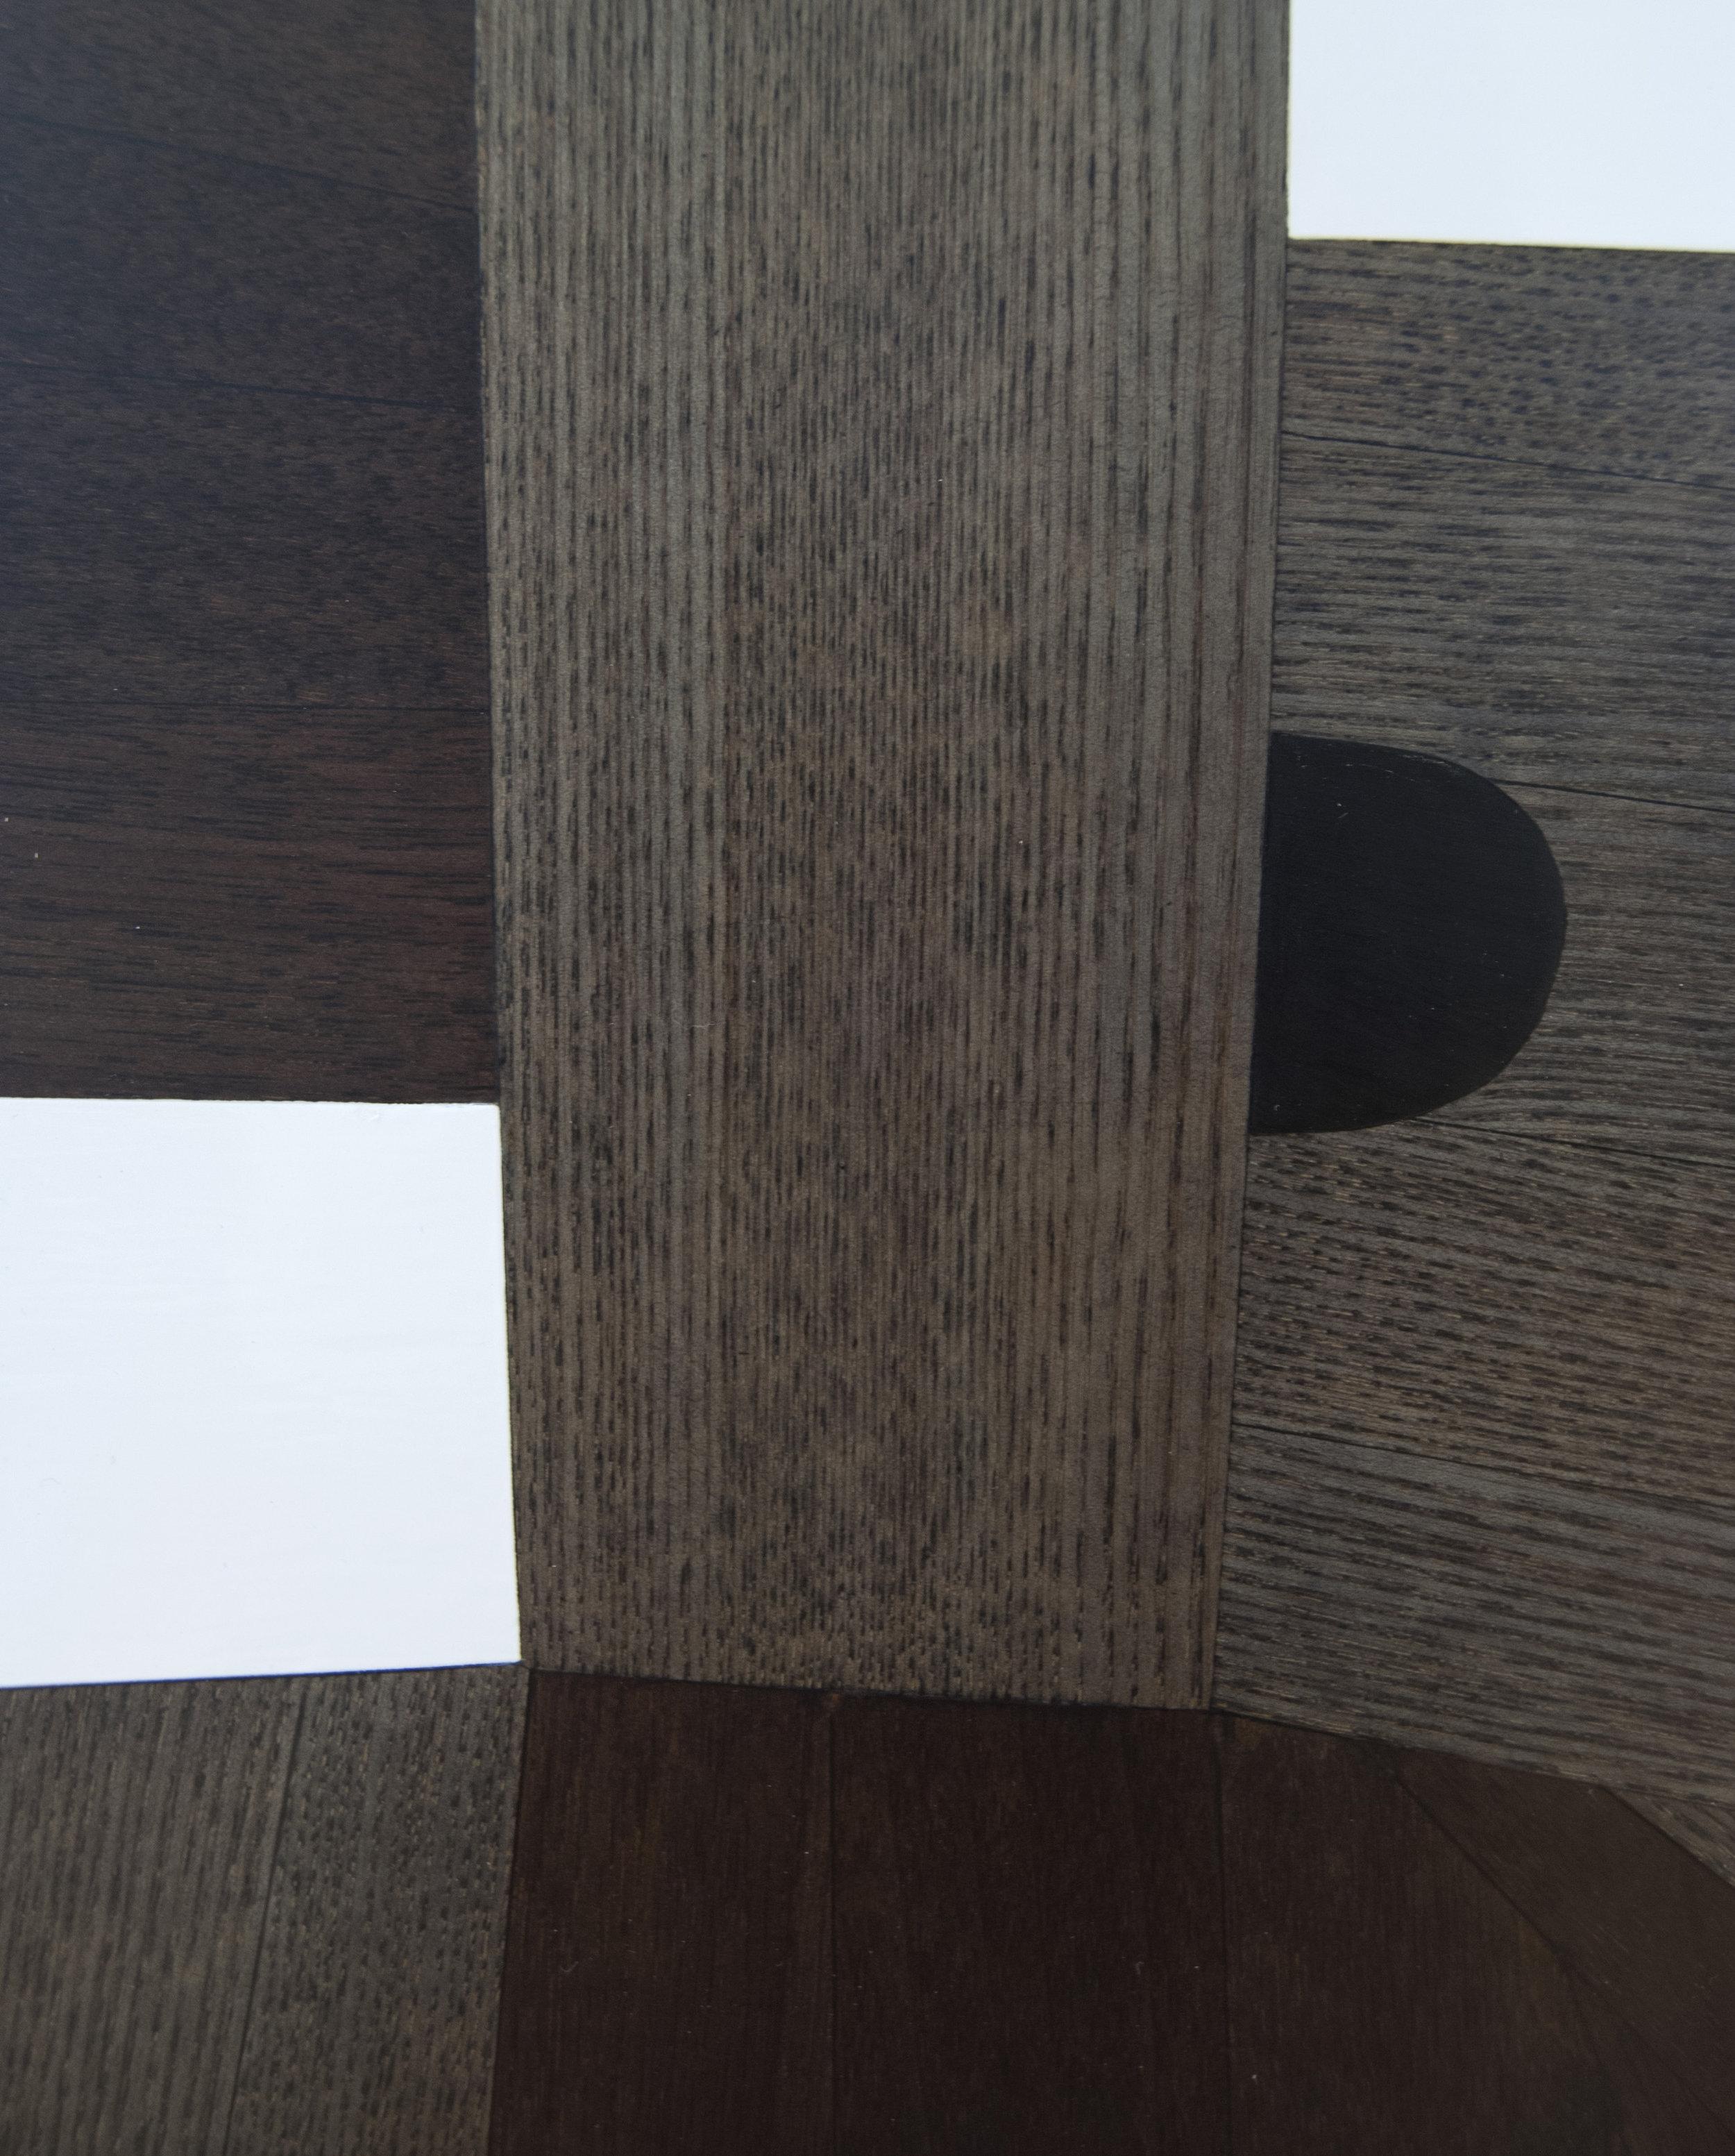 Bartlett_Ponderosa_2018_24x18x5inches_wood_stain_paint_6.jpg